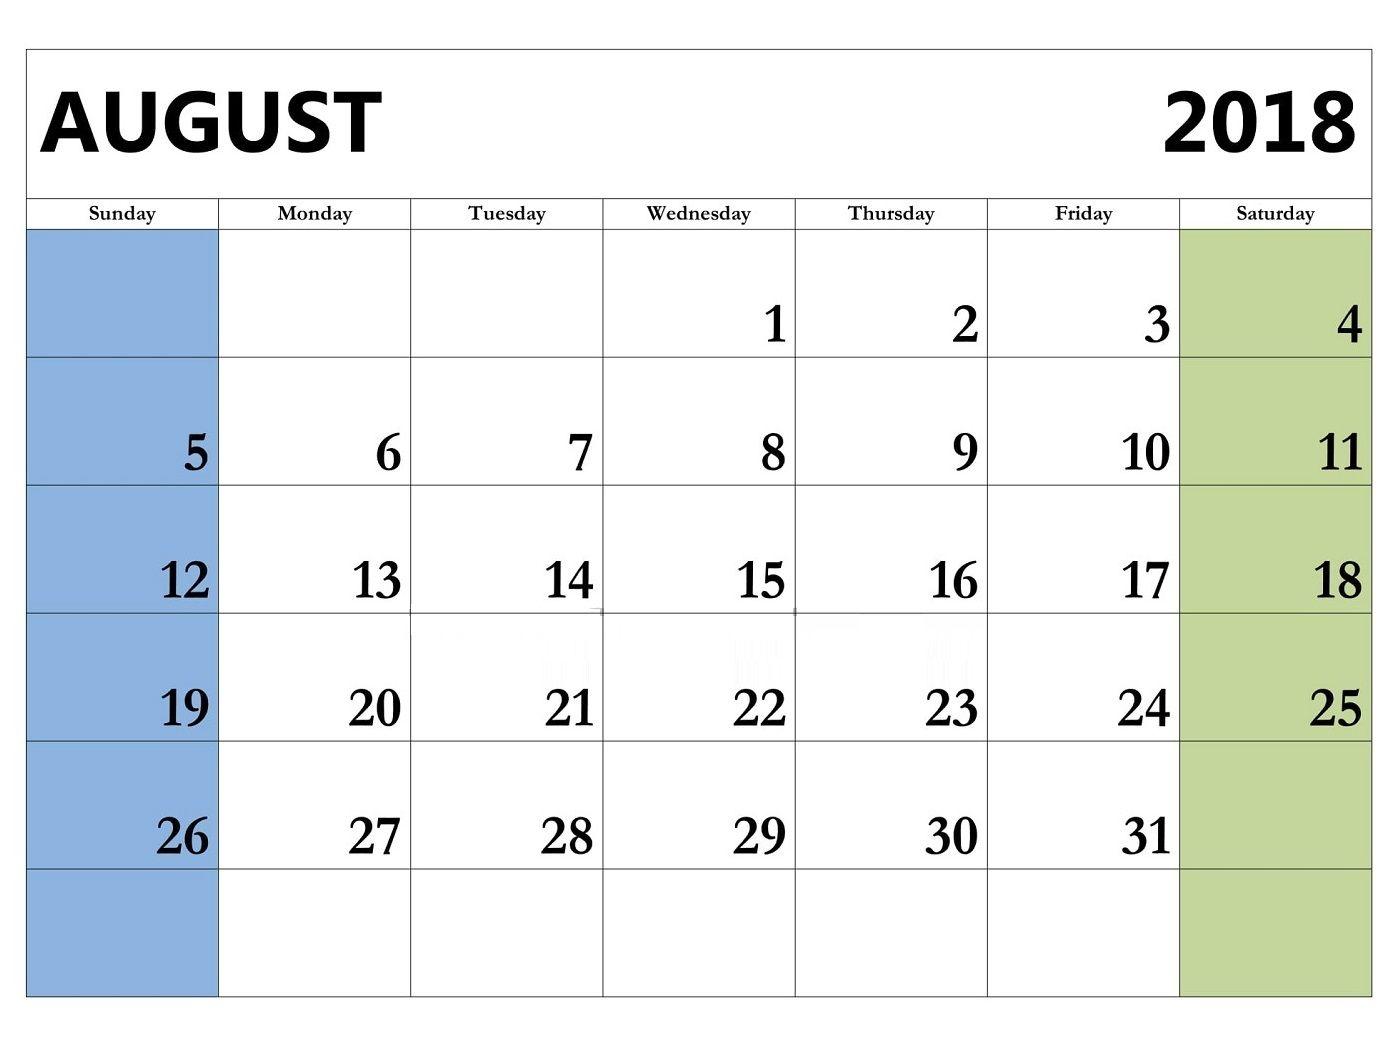 Printable august 2018 word calendar template maxcalendars printable august 2018 word calendar template maxwellsz